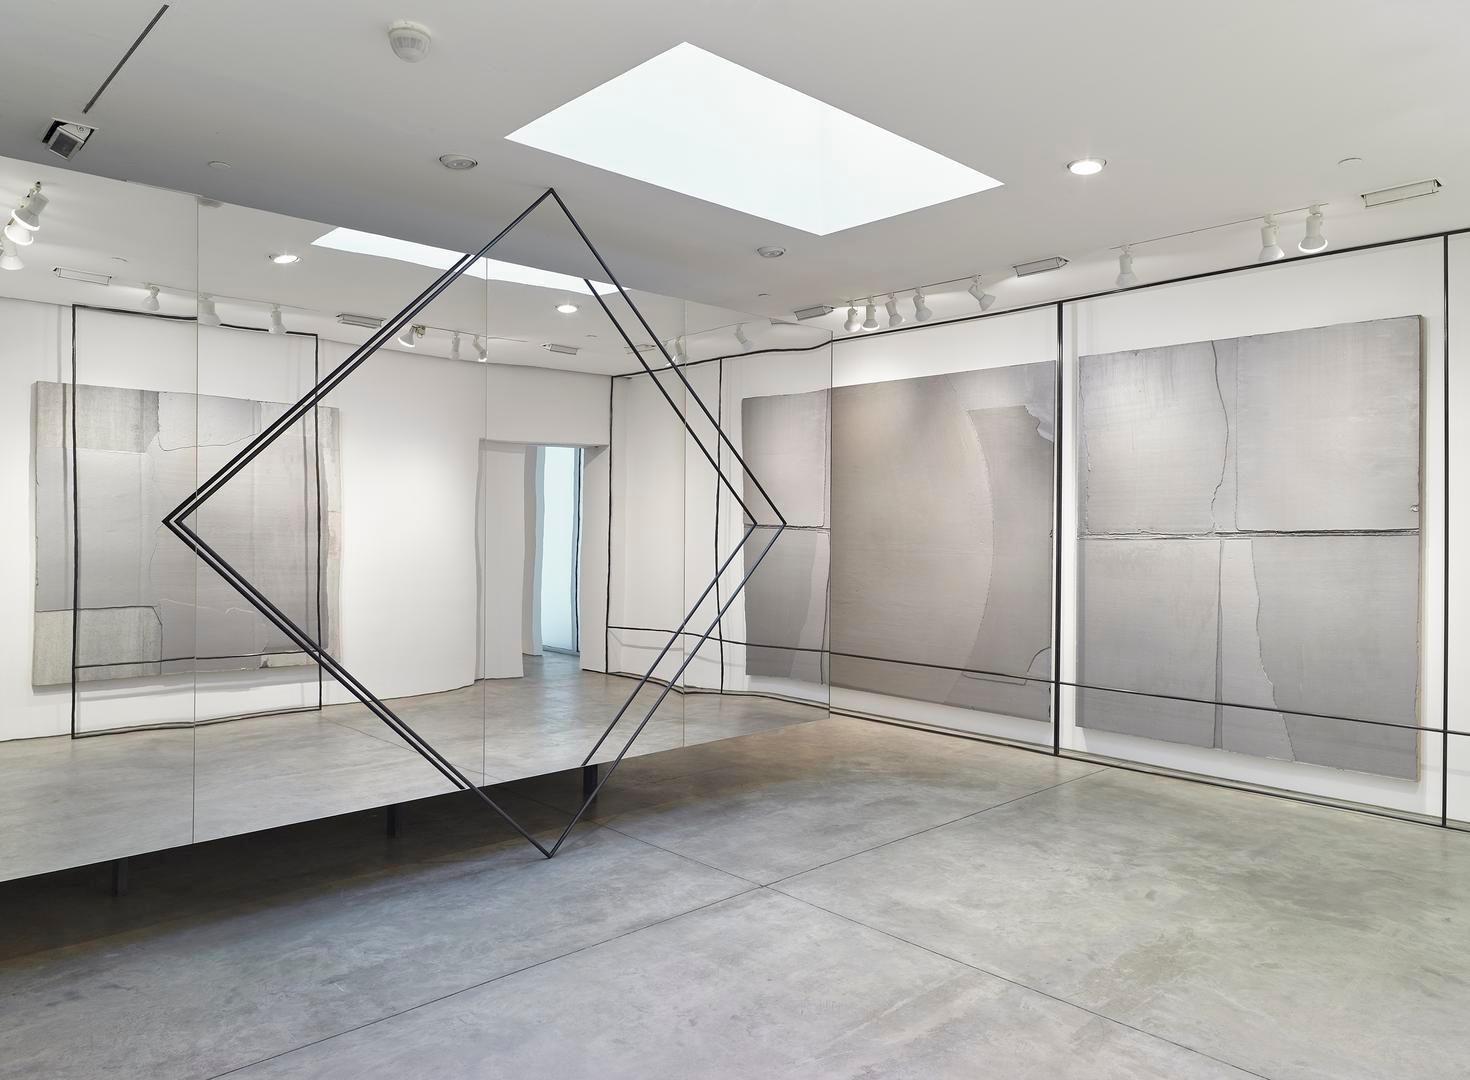 LIU WEI Installation view 3